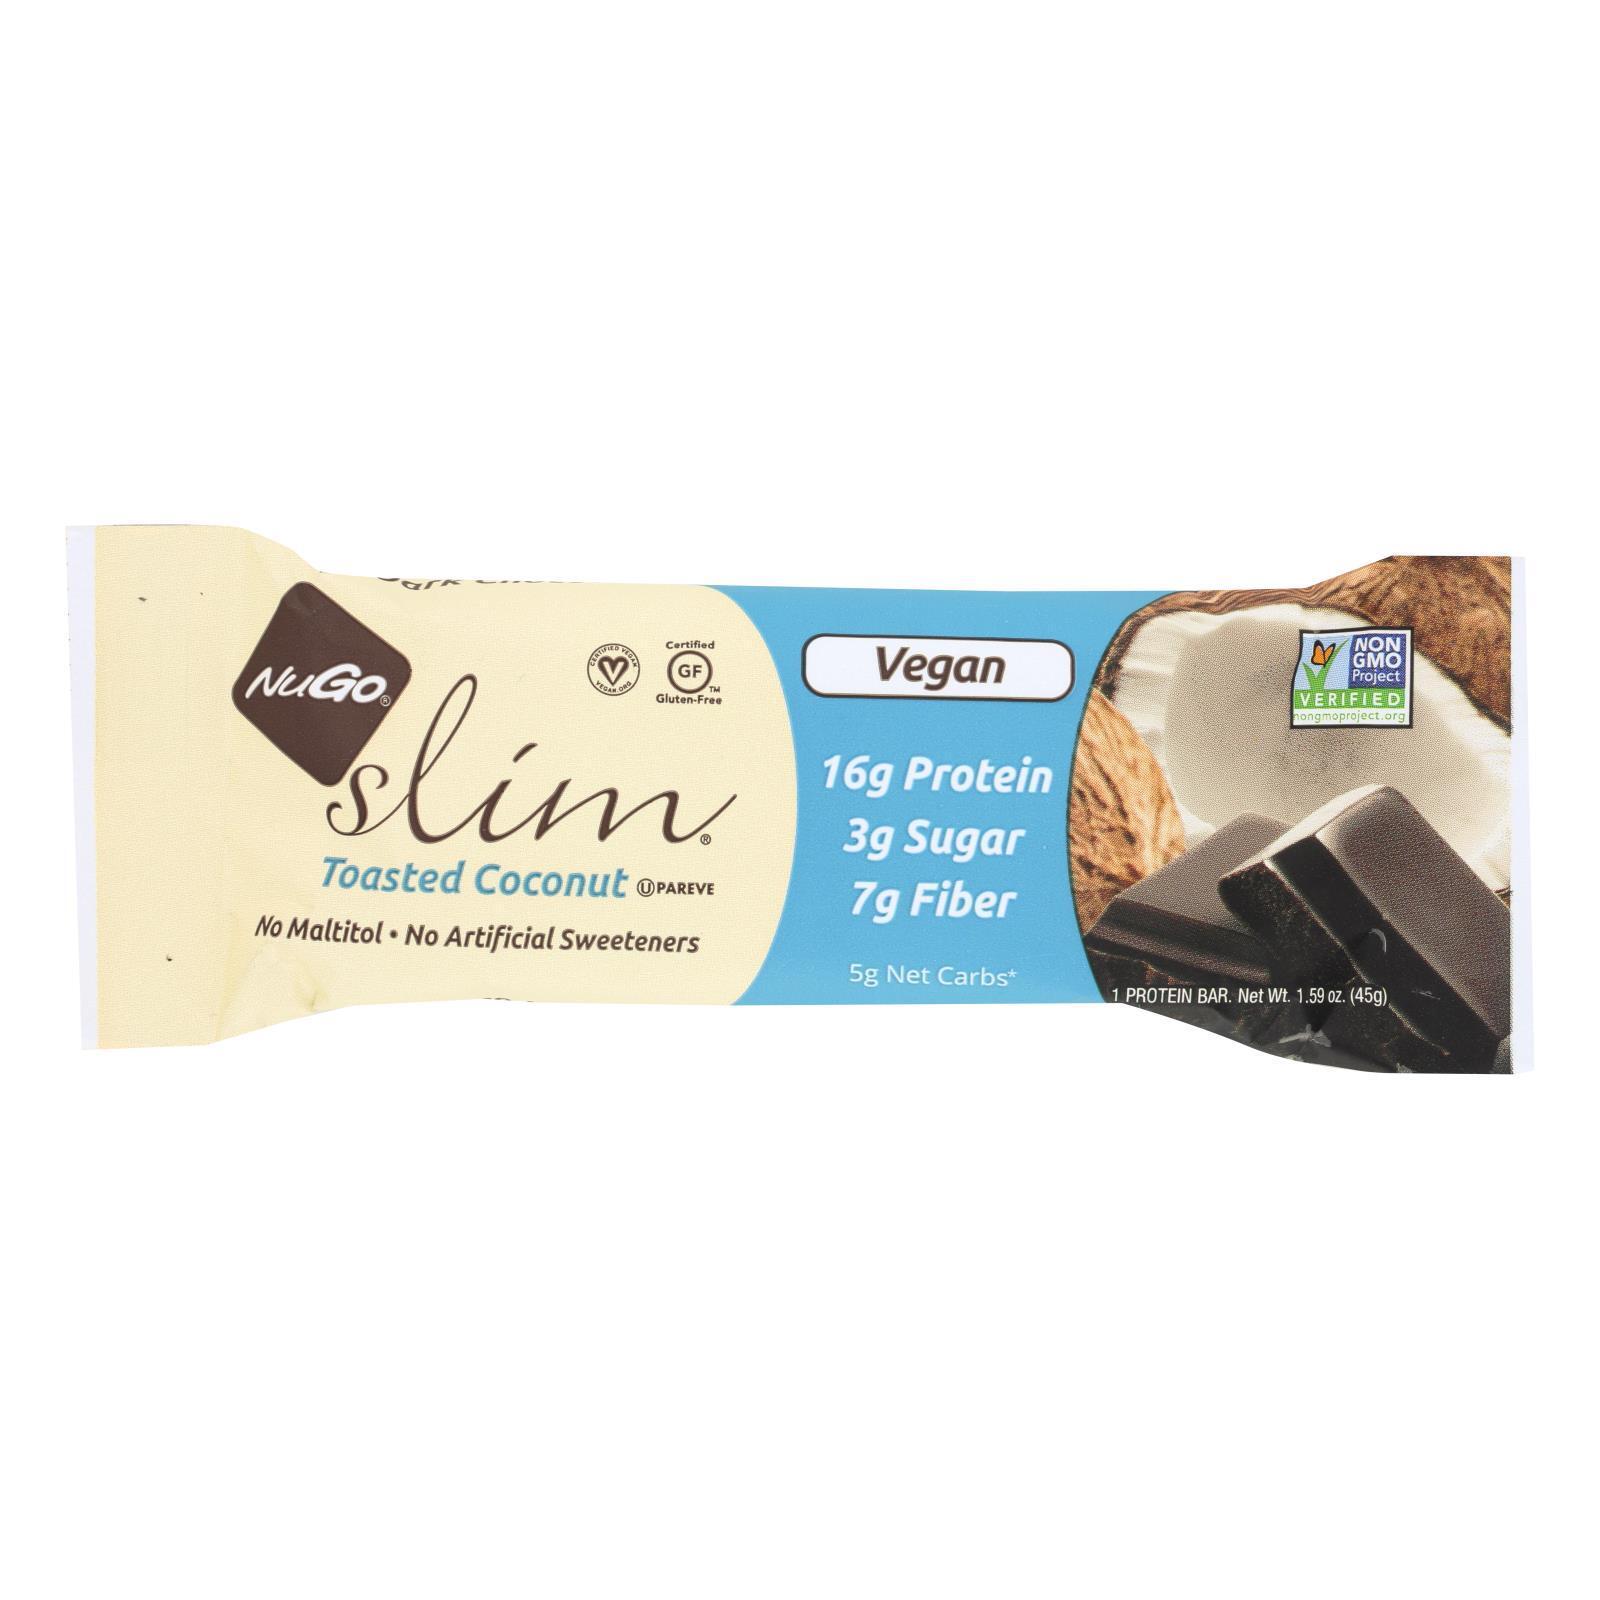 Nugo Nutrition Bar Nugo Slim Bar - Toasted Coconut - Case of 12 - 1.59 oz